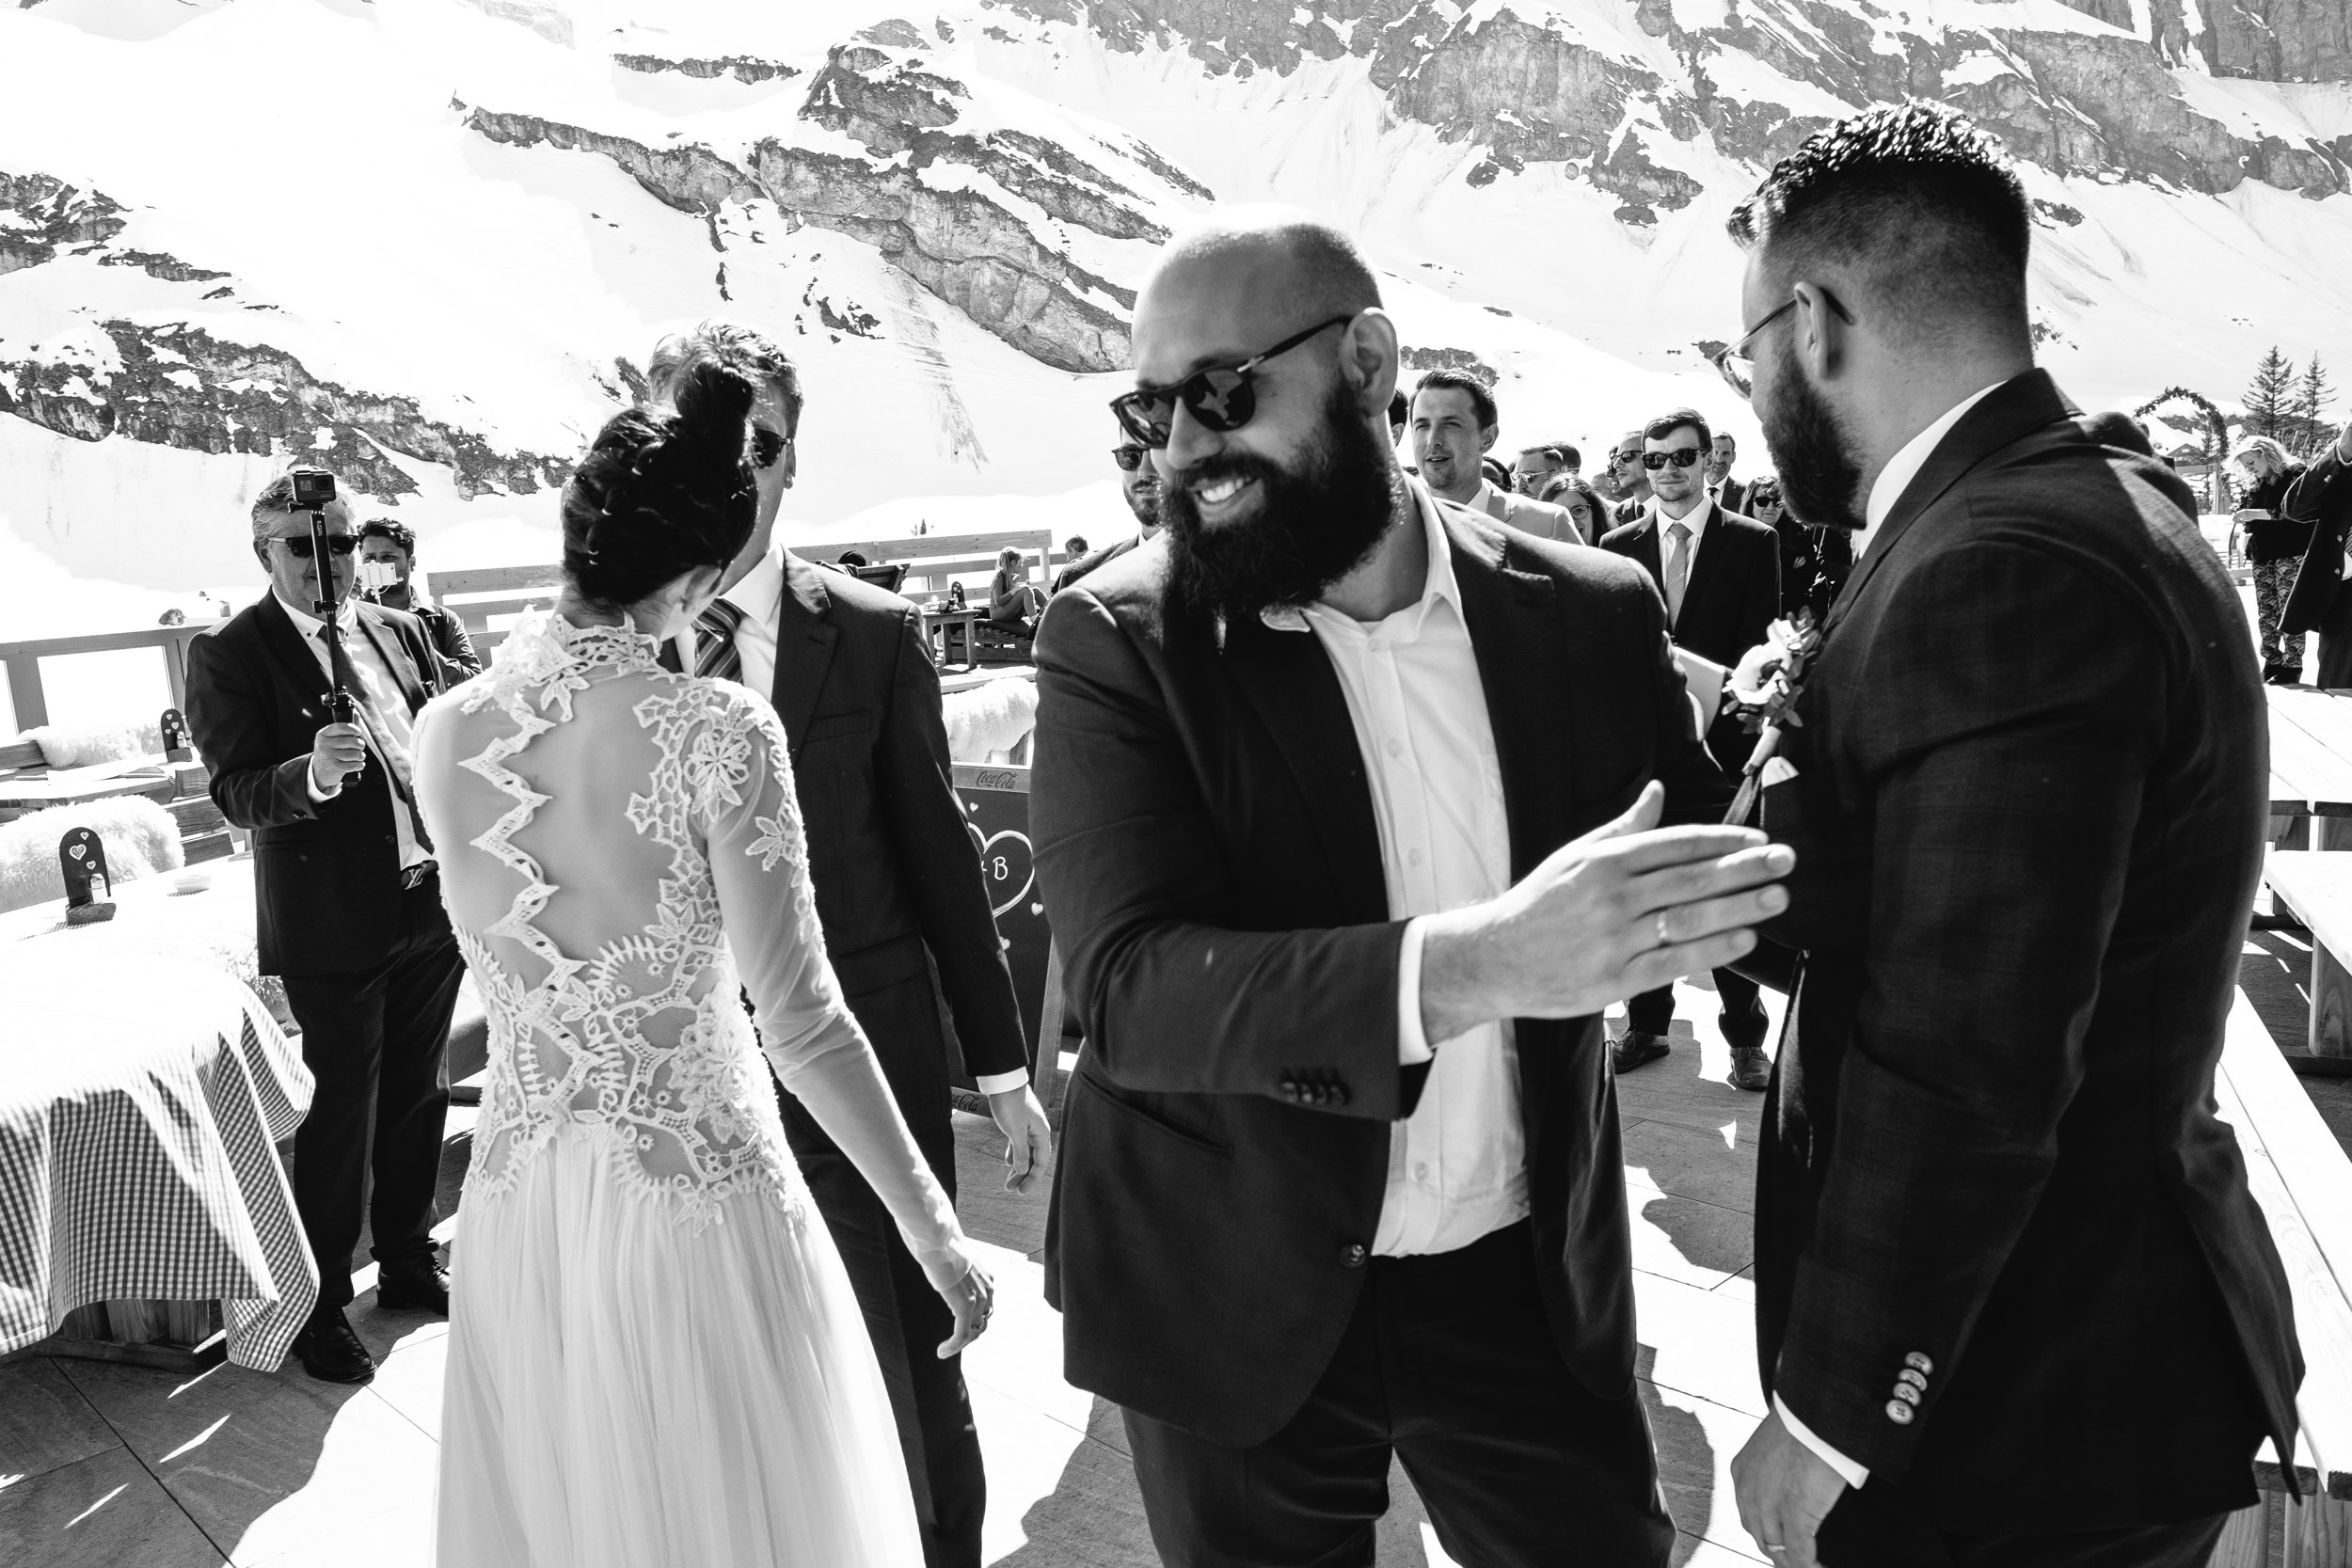 lynn-bastian-switzerland-wedding-photography-72.jpg